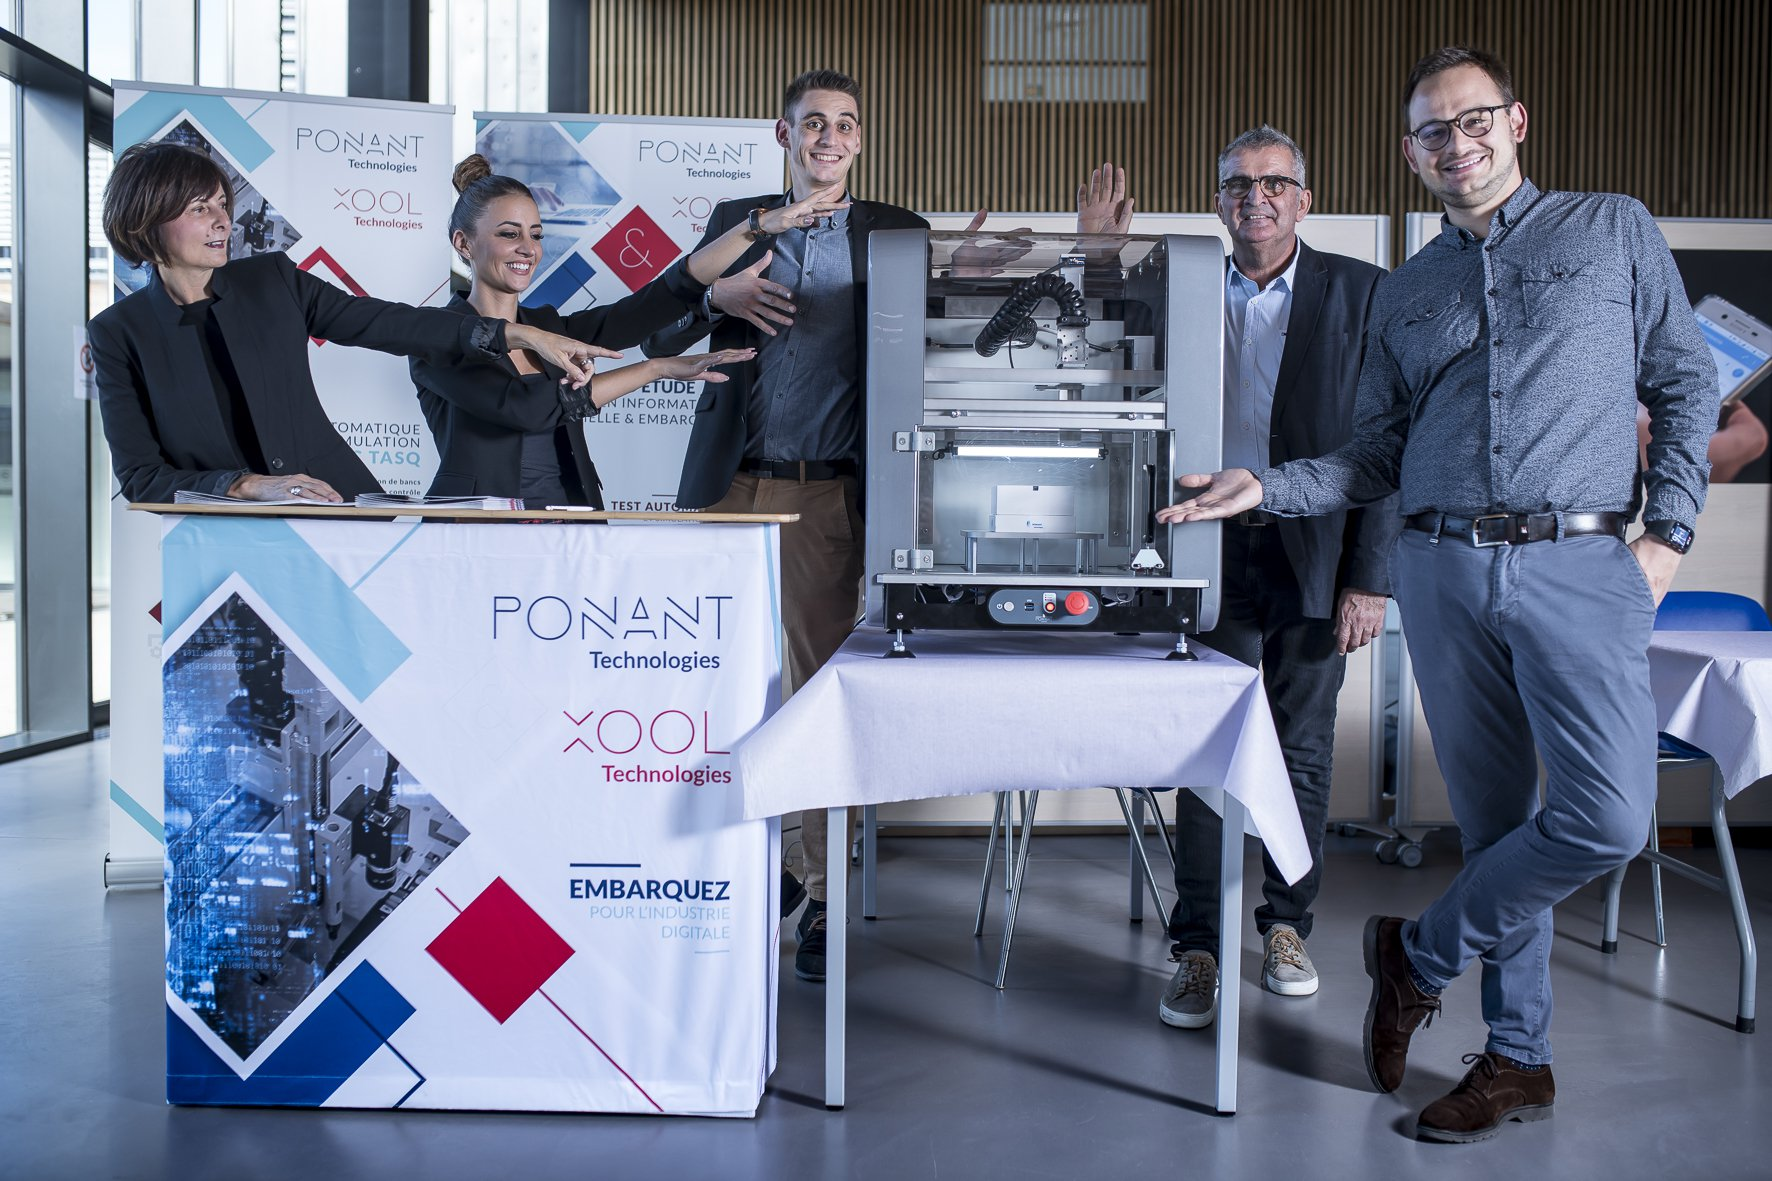 L'entreprise Ponant Technologies, lors de Mardinnov